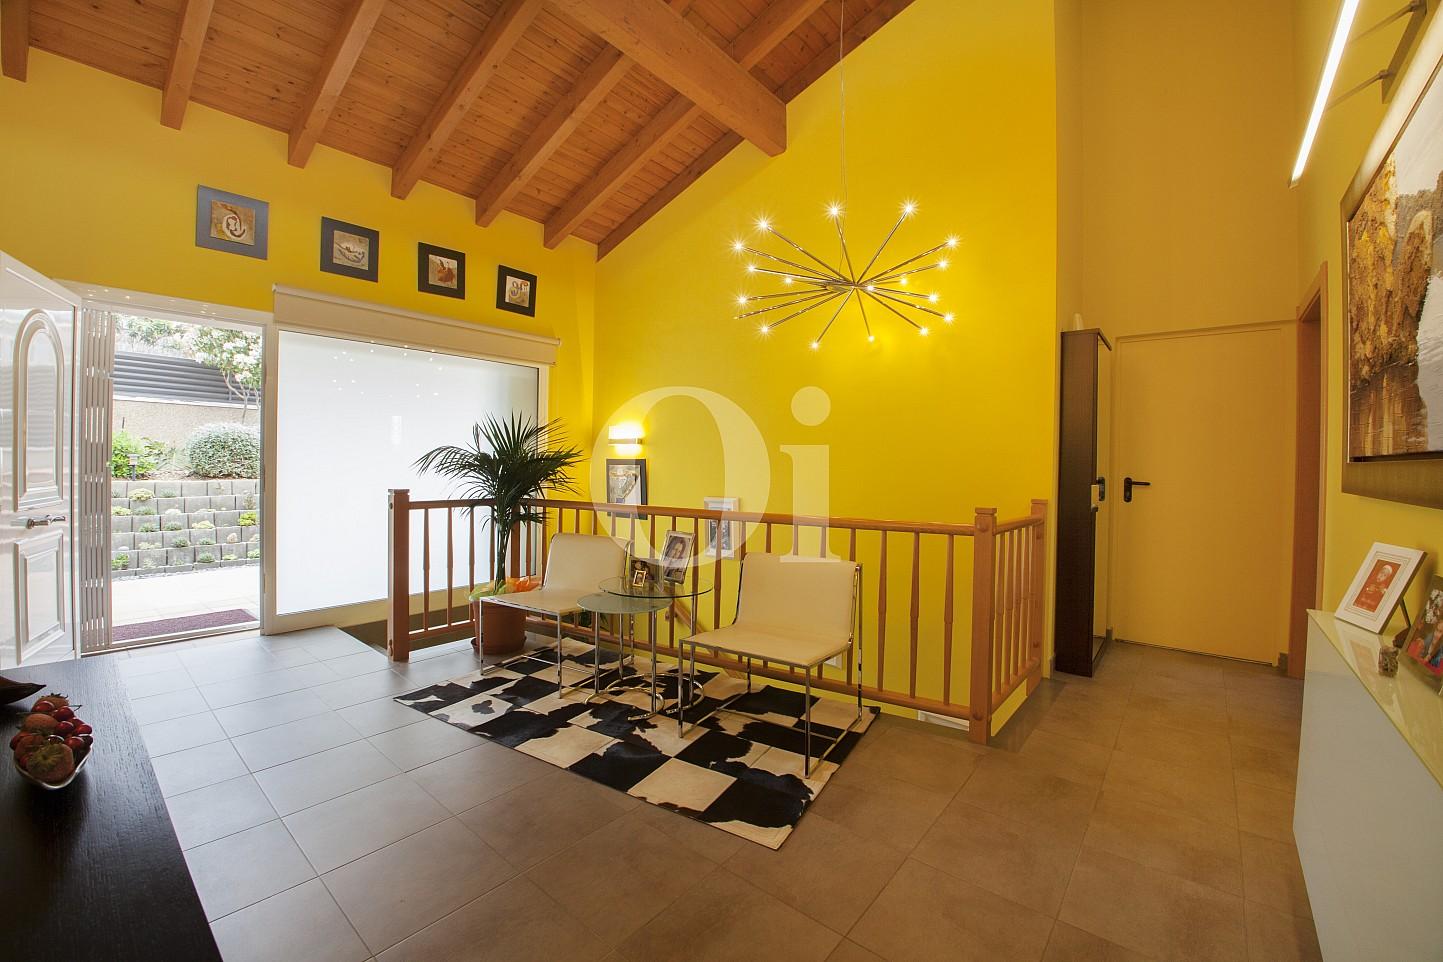 Escaleras de casa en venta en Segur de Calafell, Baix Penedès, Tarragona